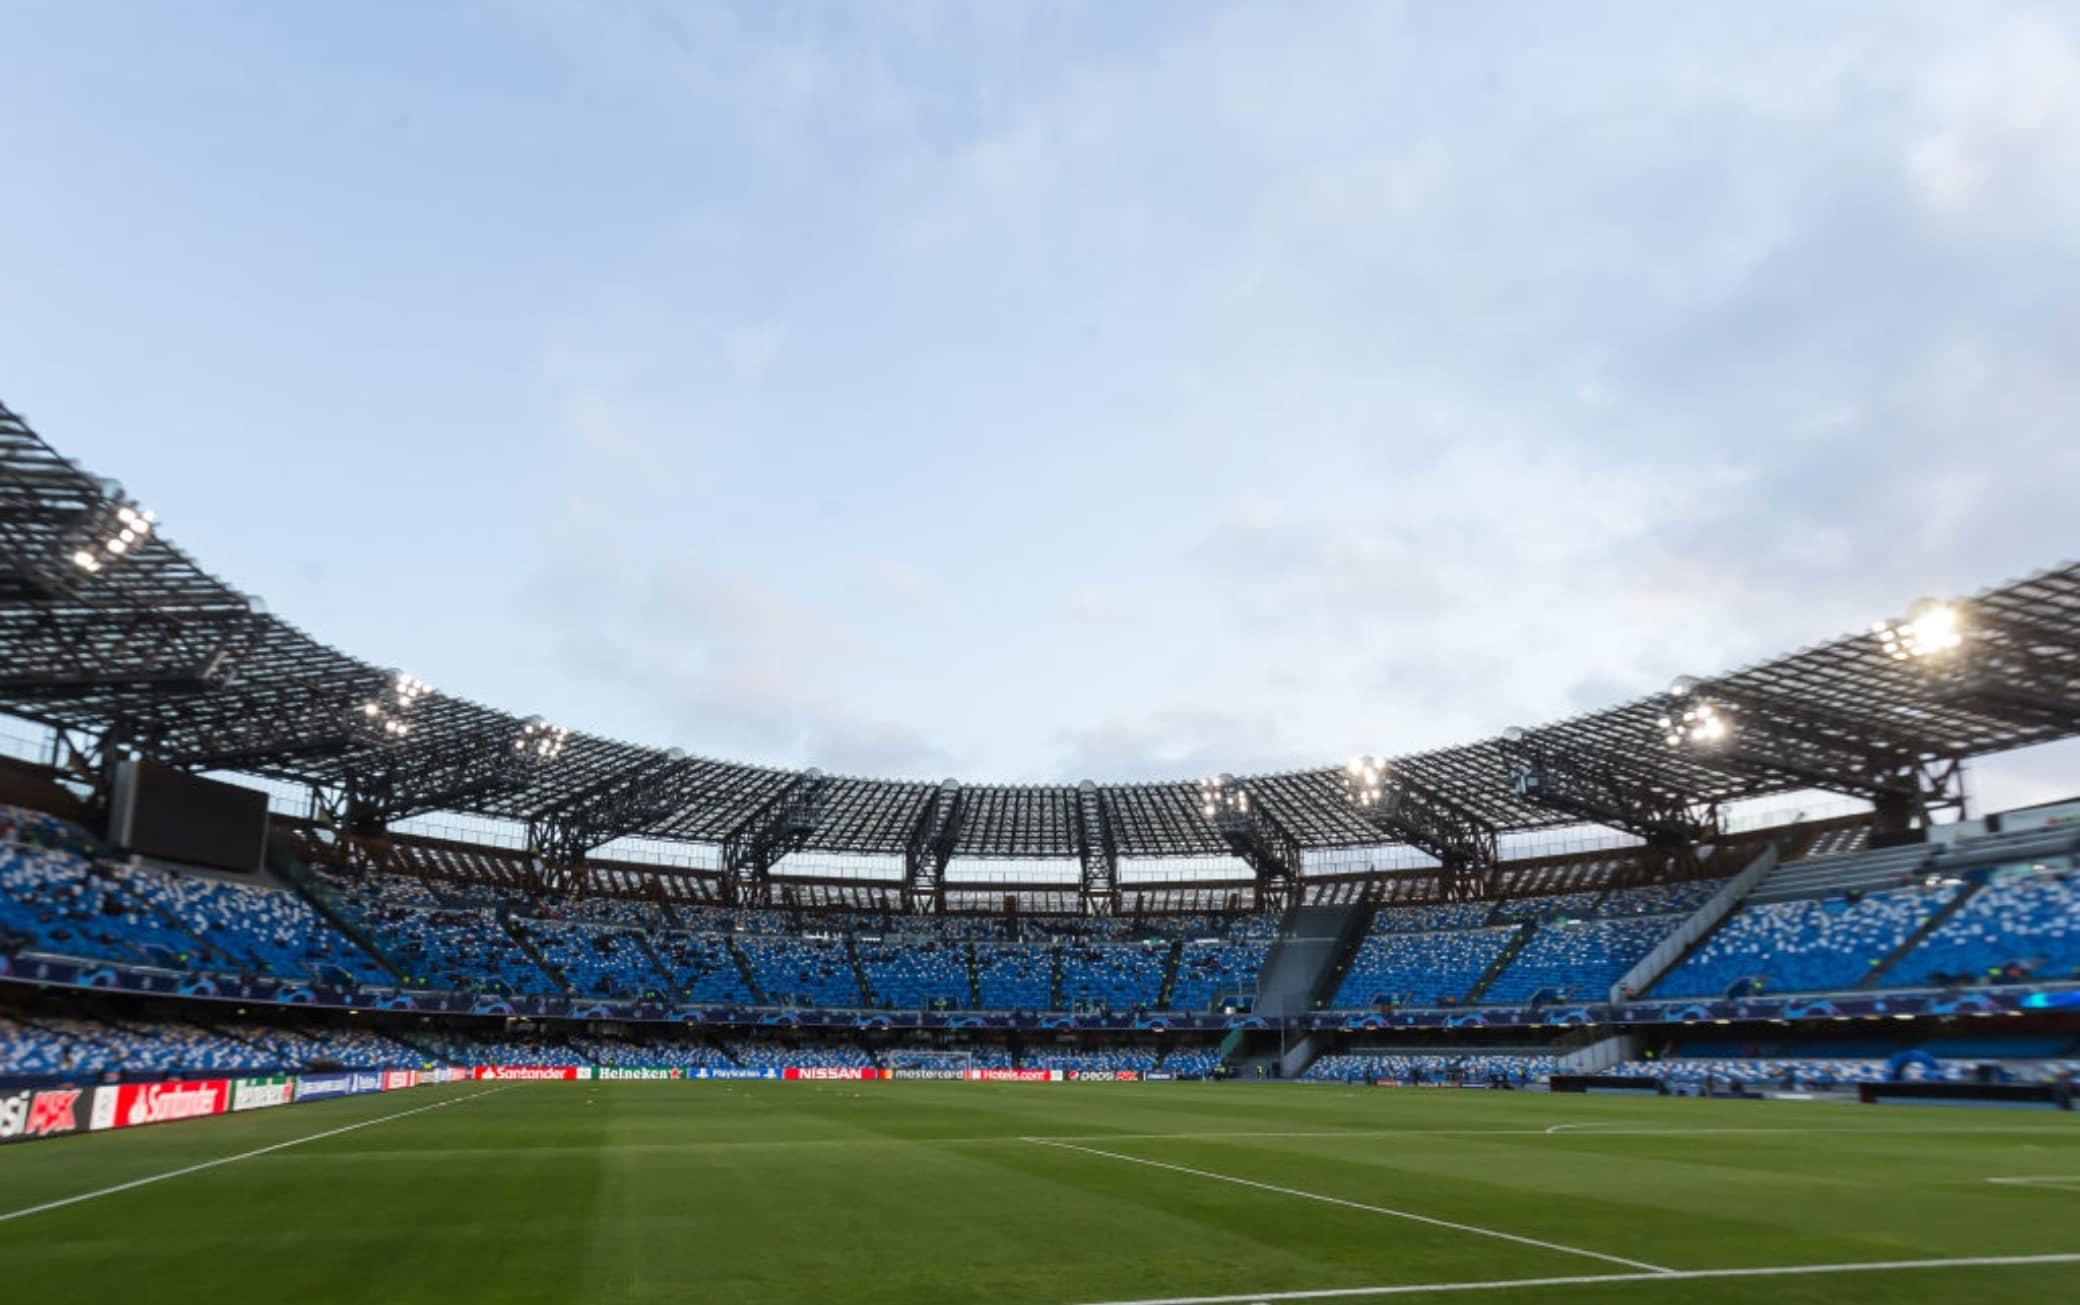 Risultato immagini per stadio olimpico porte chiuse